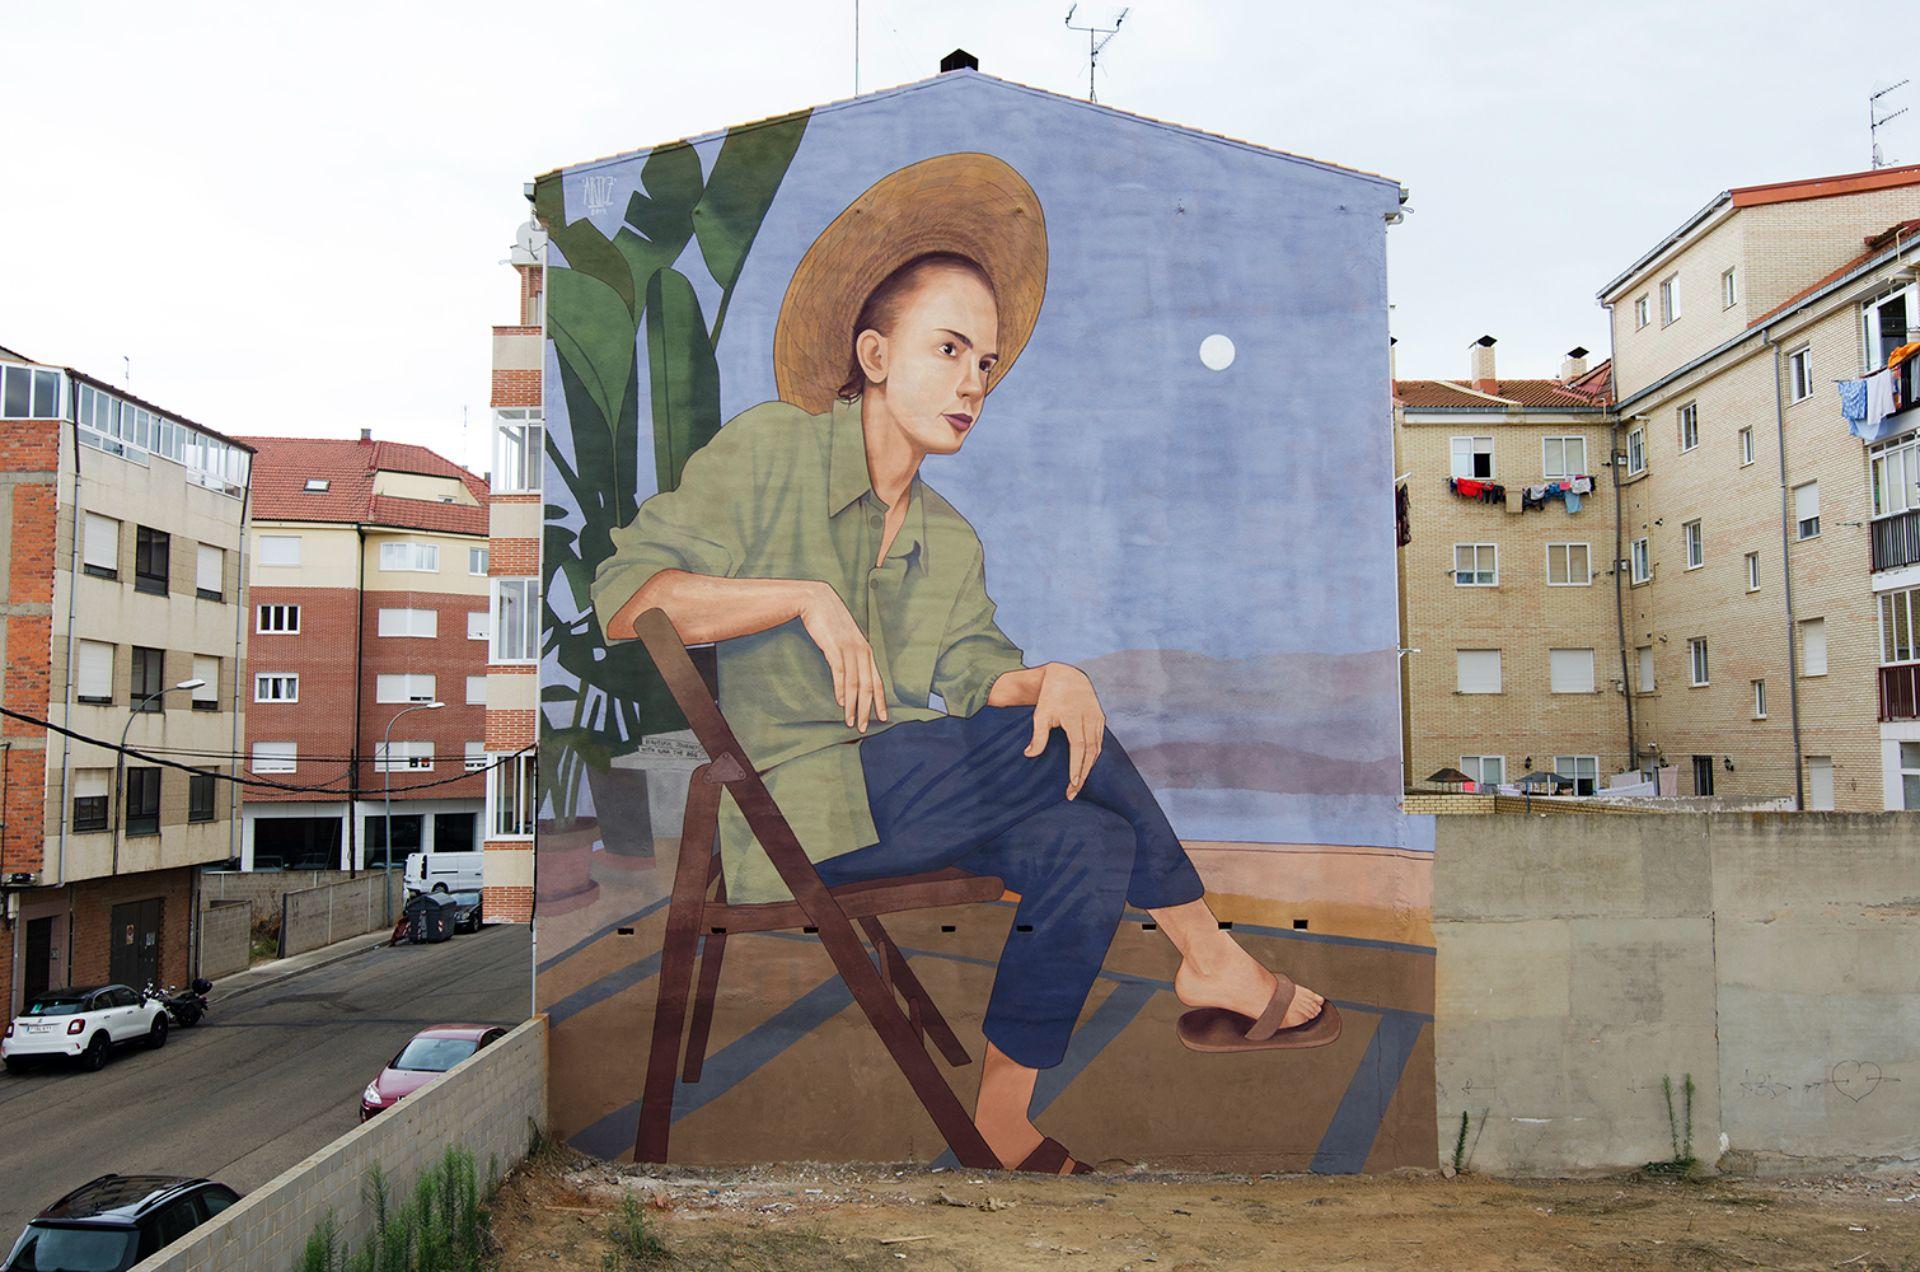 Artez_WaitingMural_LaBaneza_Spain_2019_05_mini.jpg